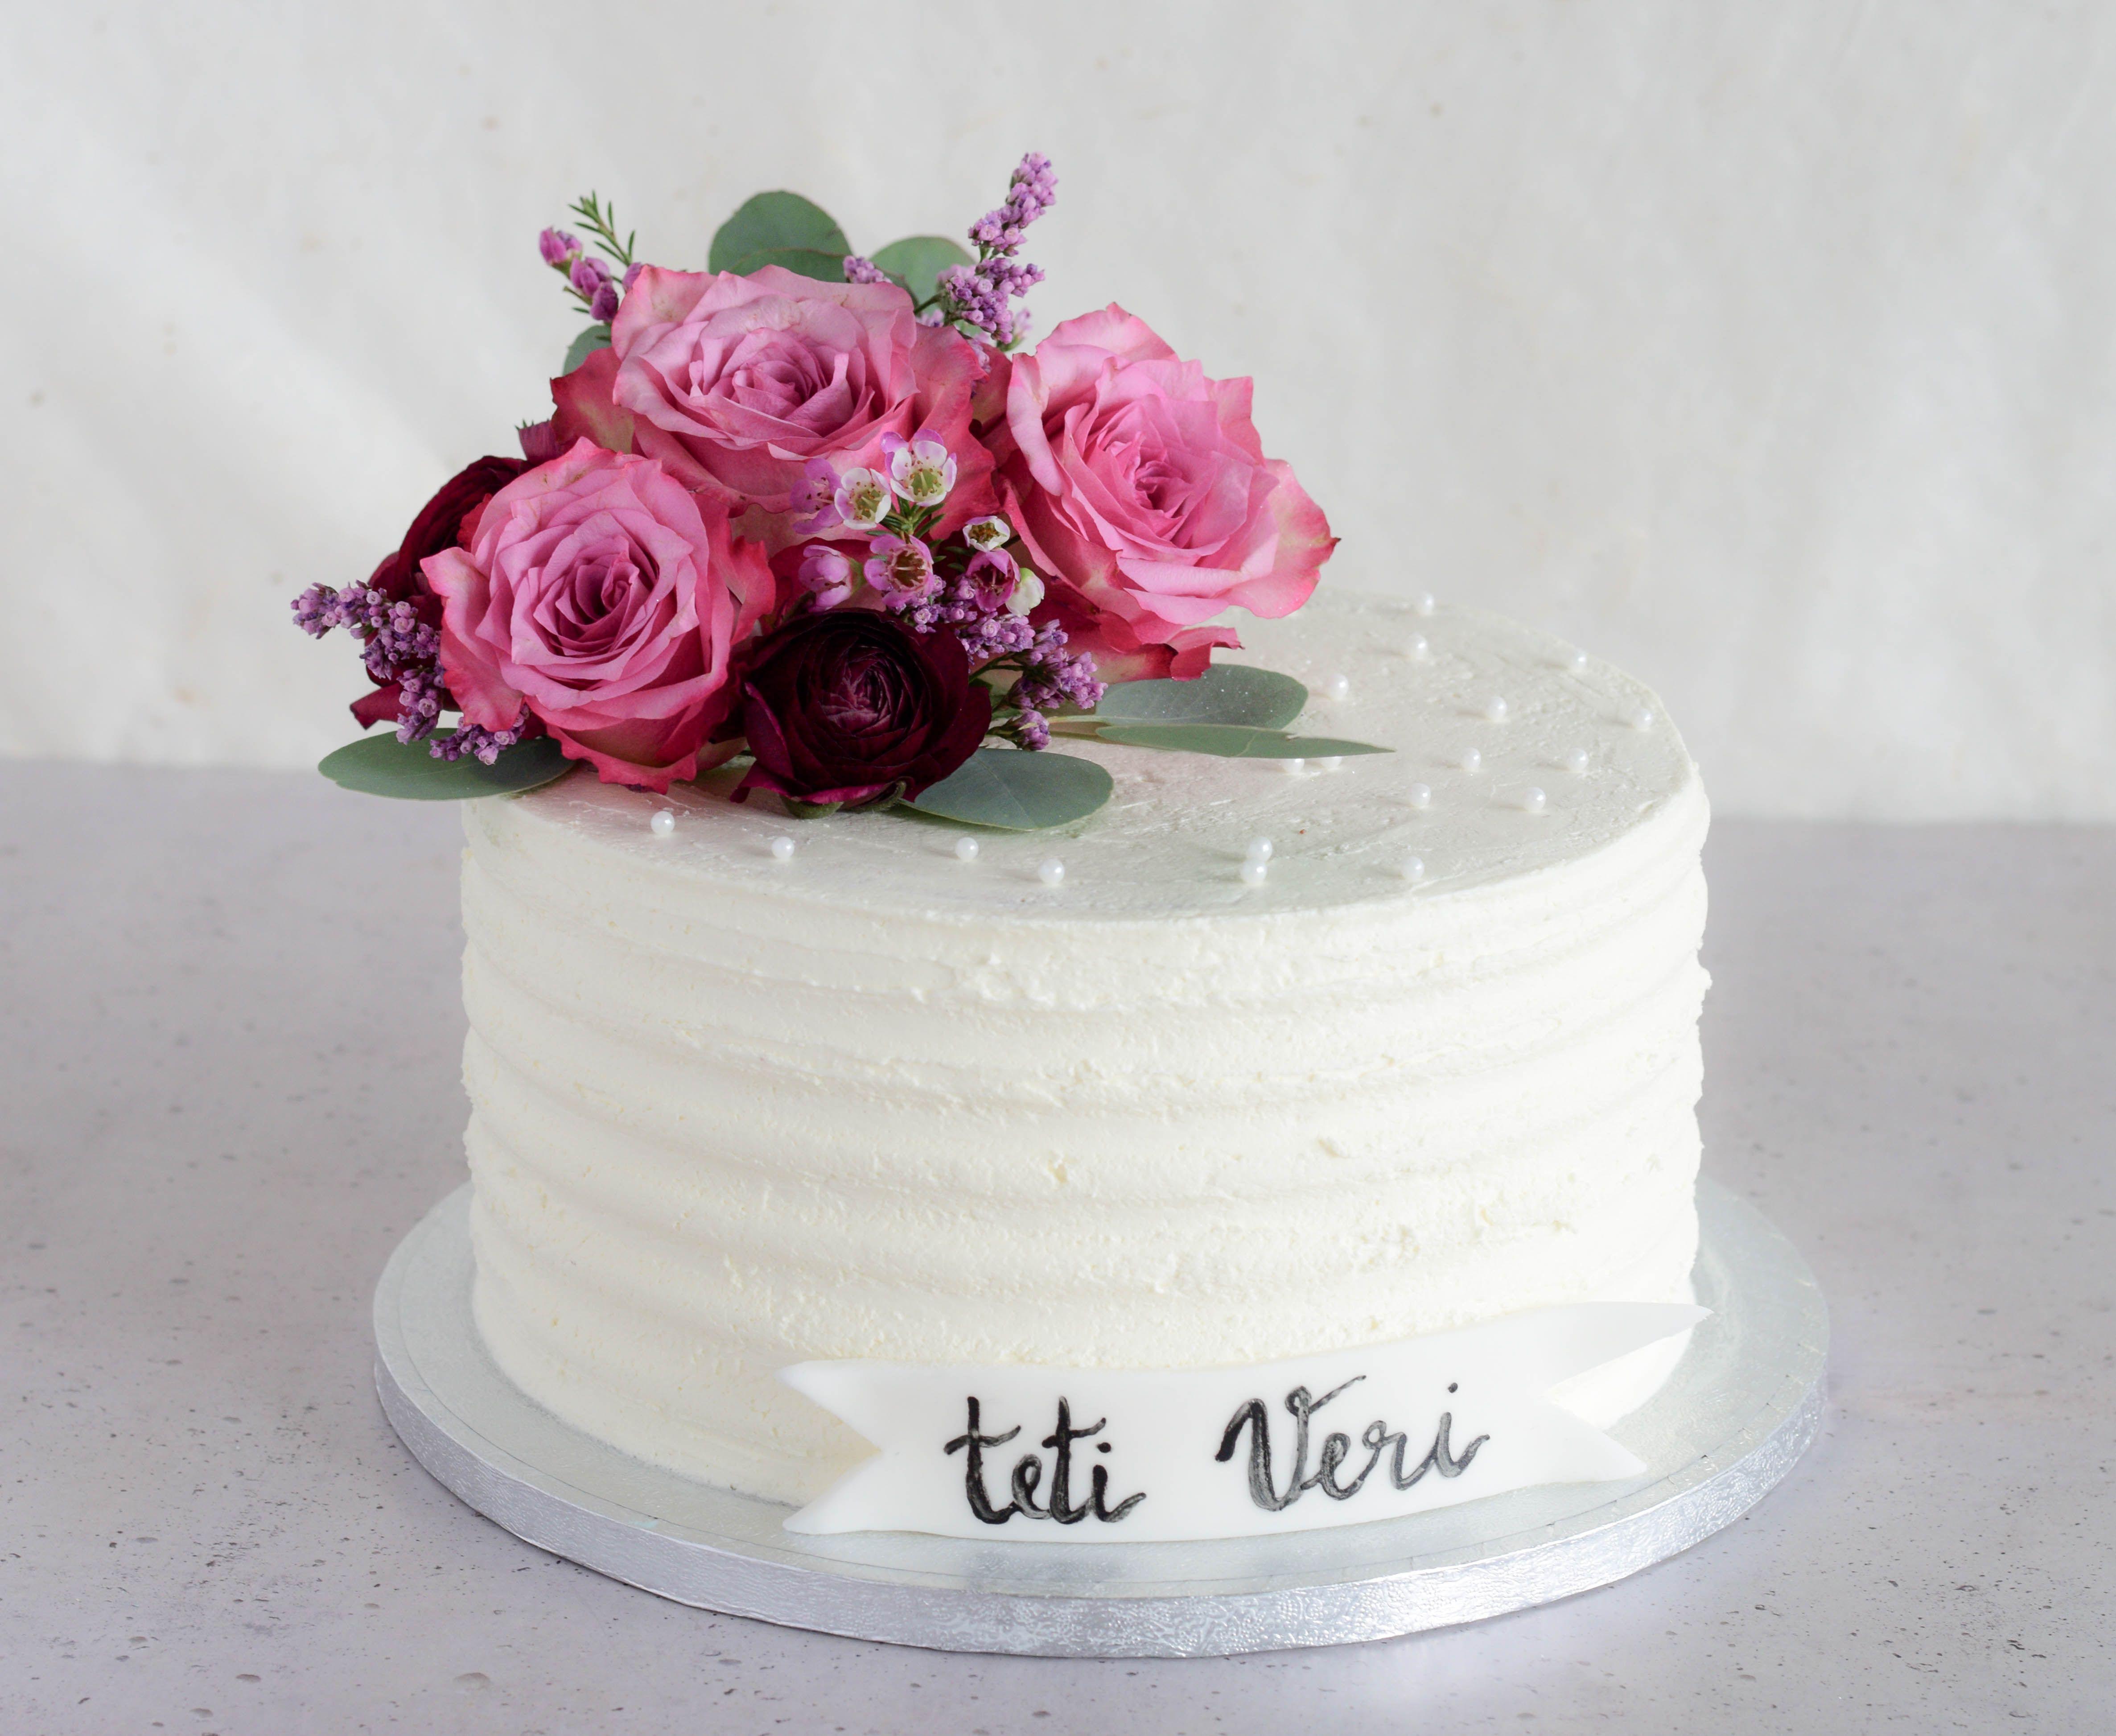 Pleasing Dobrodosli With Images Elegant Birthday Cakes Fresh Flower Funny Birthday Cards Online Bapapcheapnameinfo